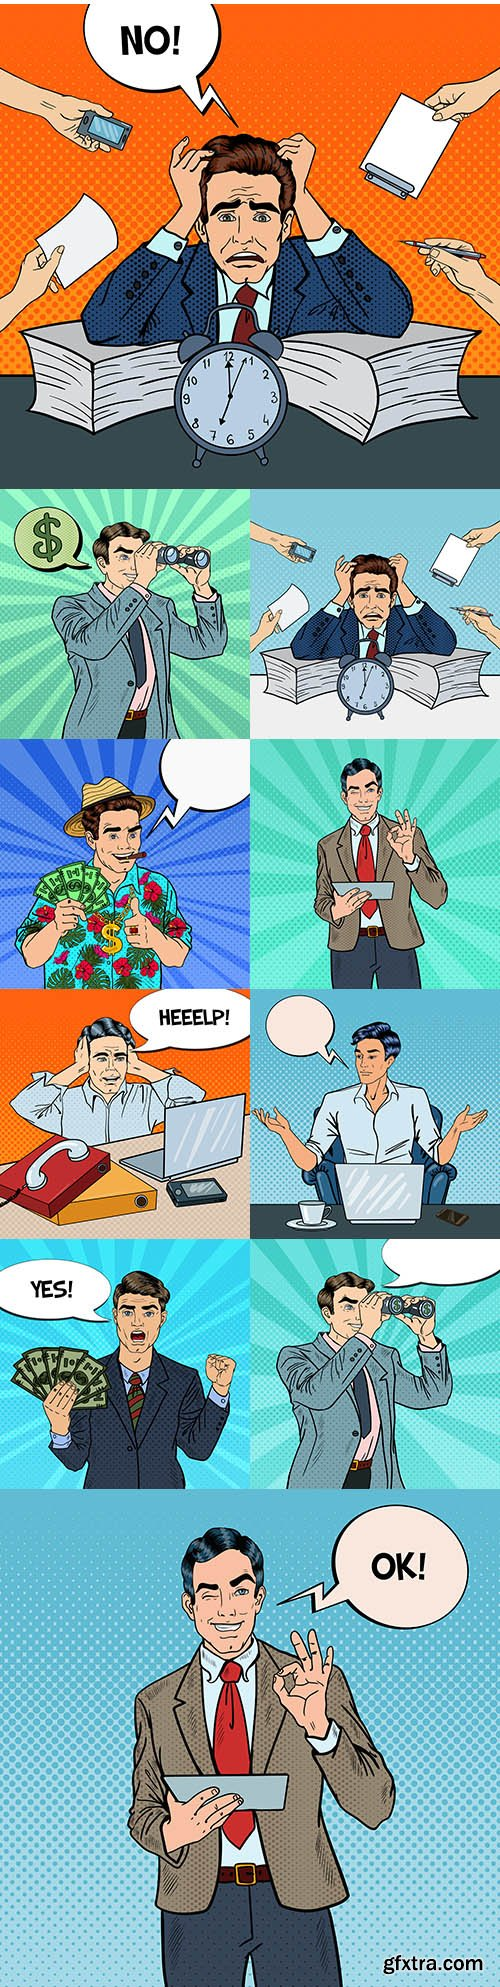 Pop art businessman in multitasking office work illustration